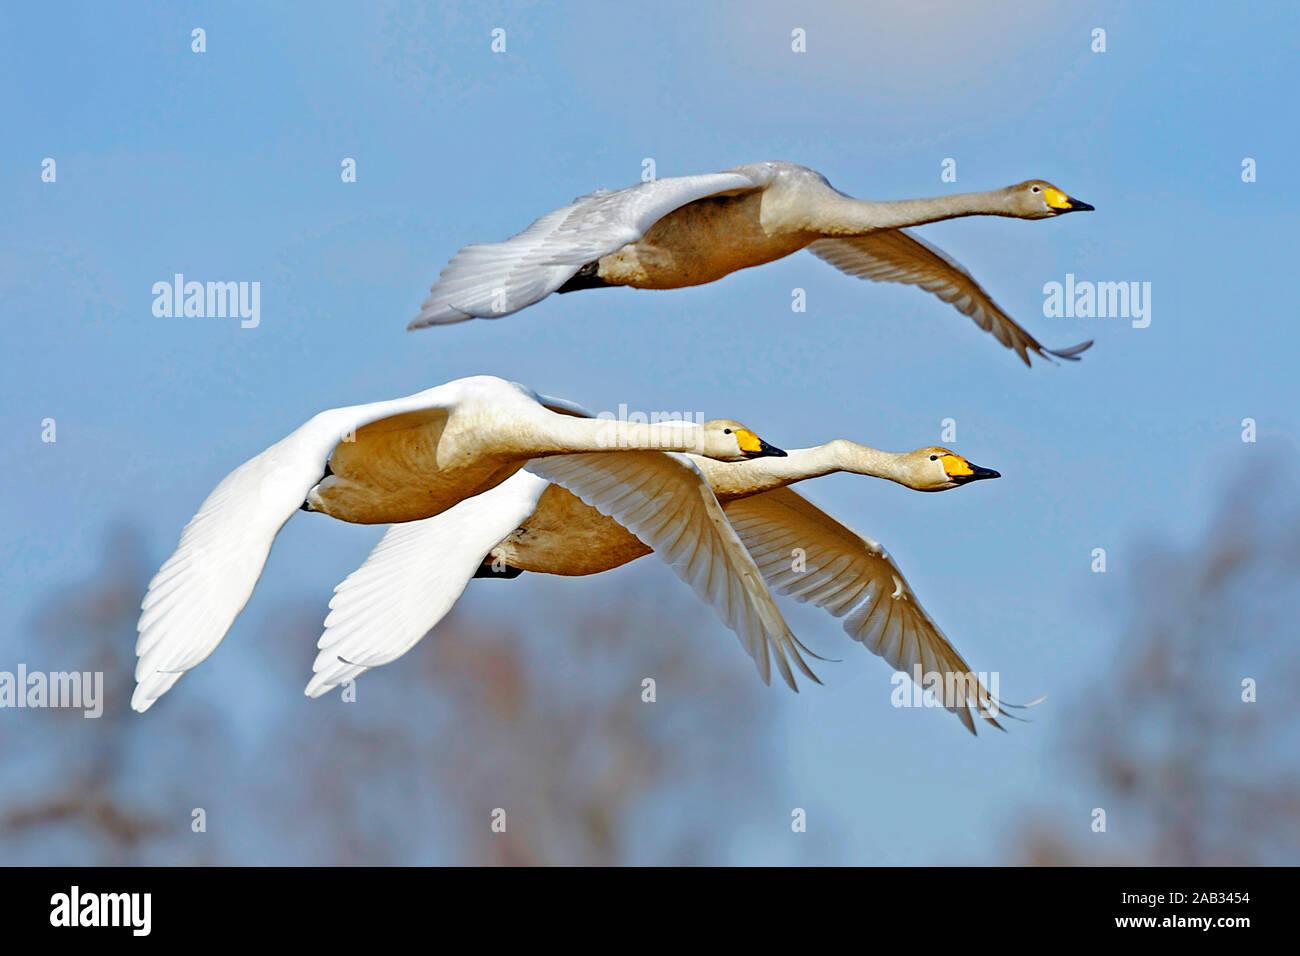 Drei Singschwaene im Flug Stock Photo